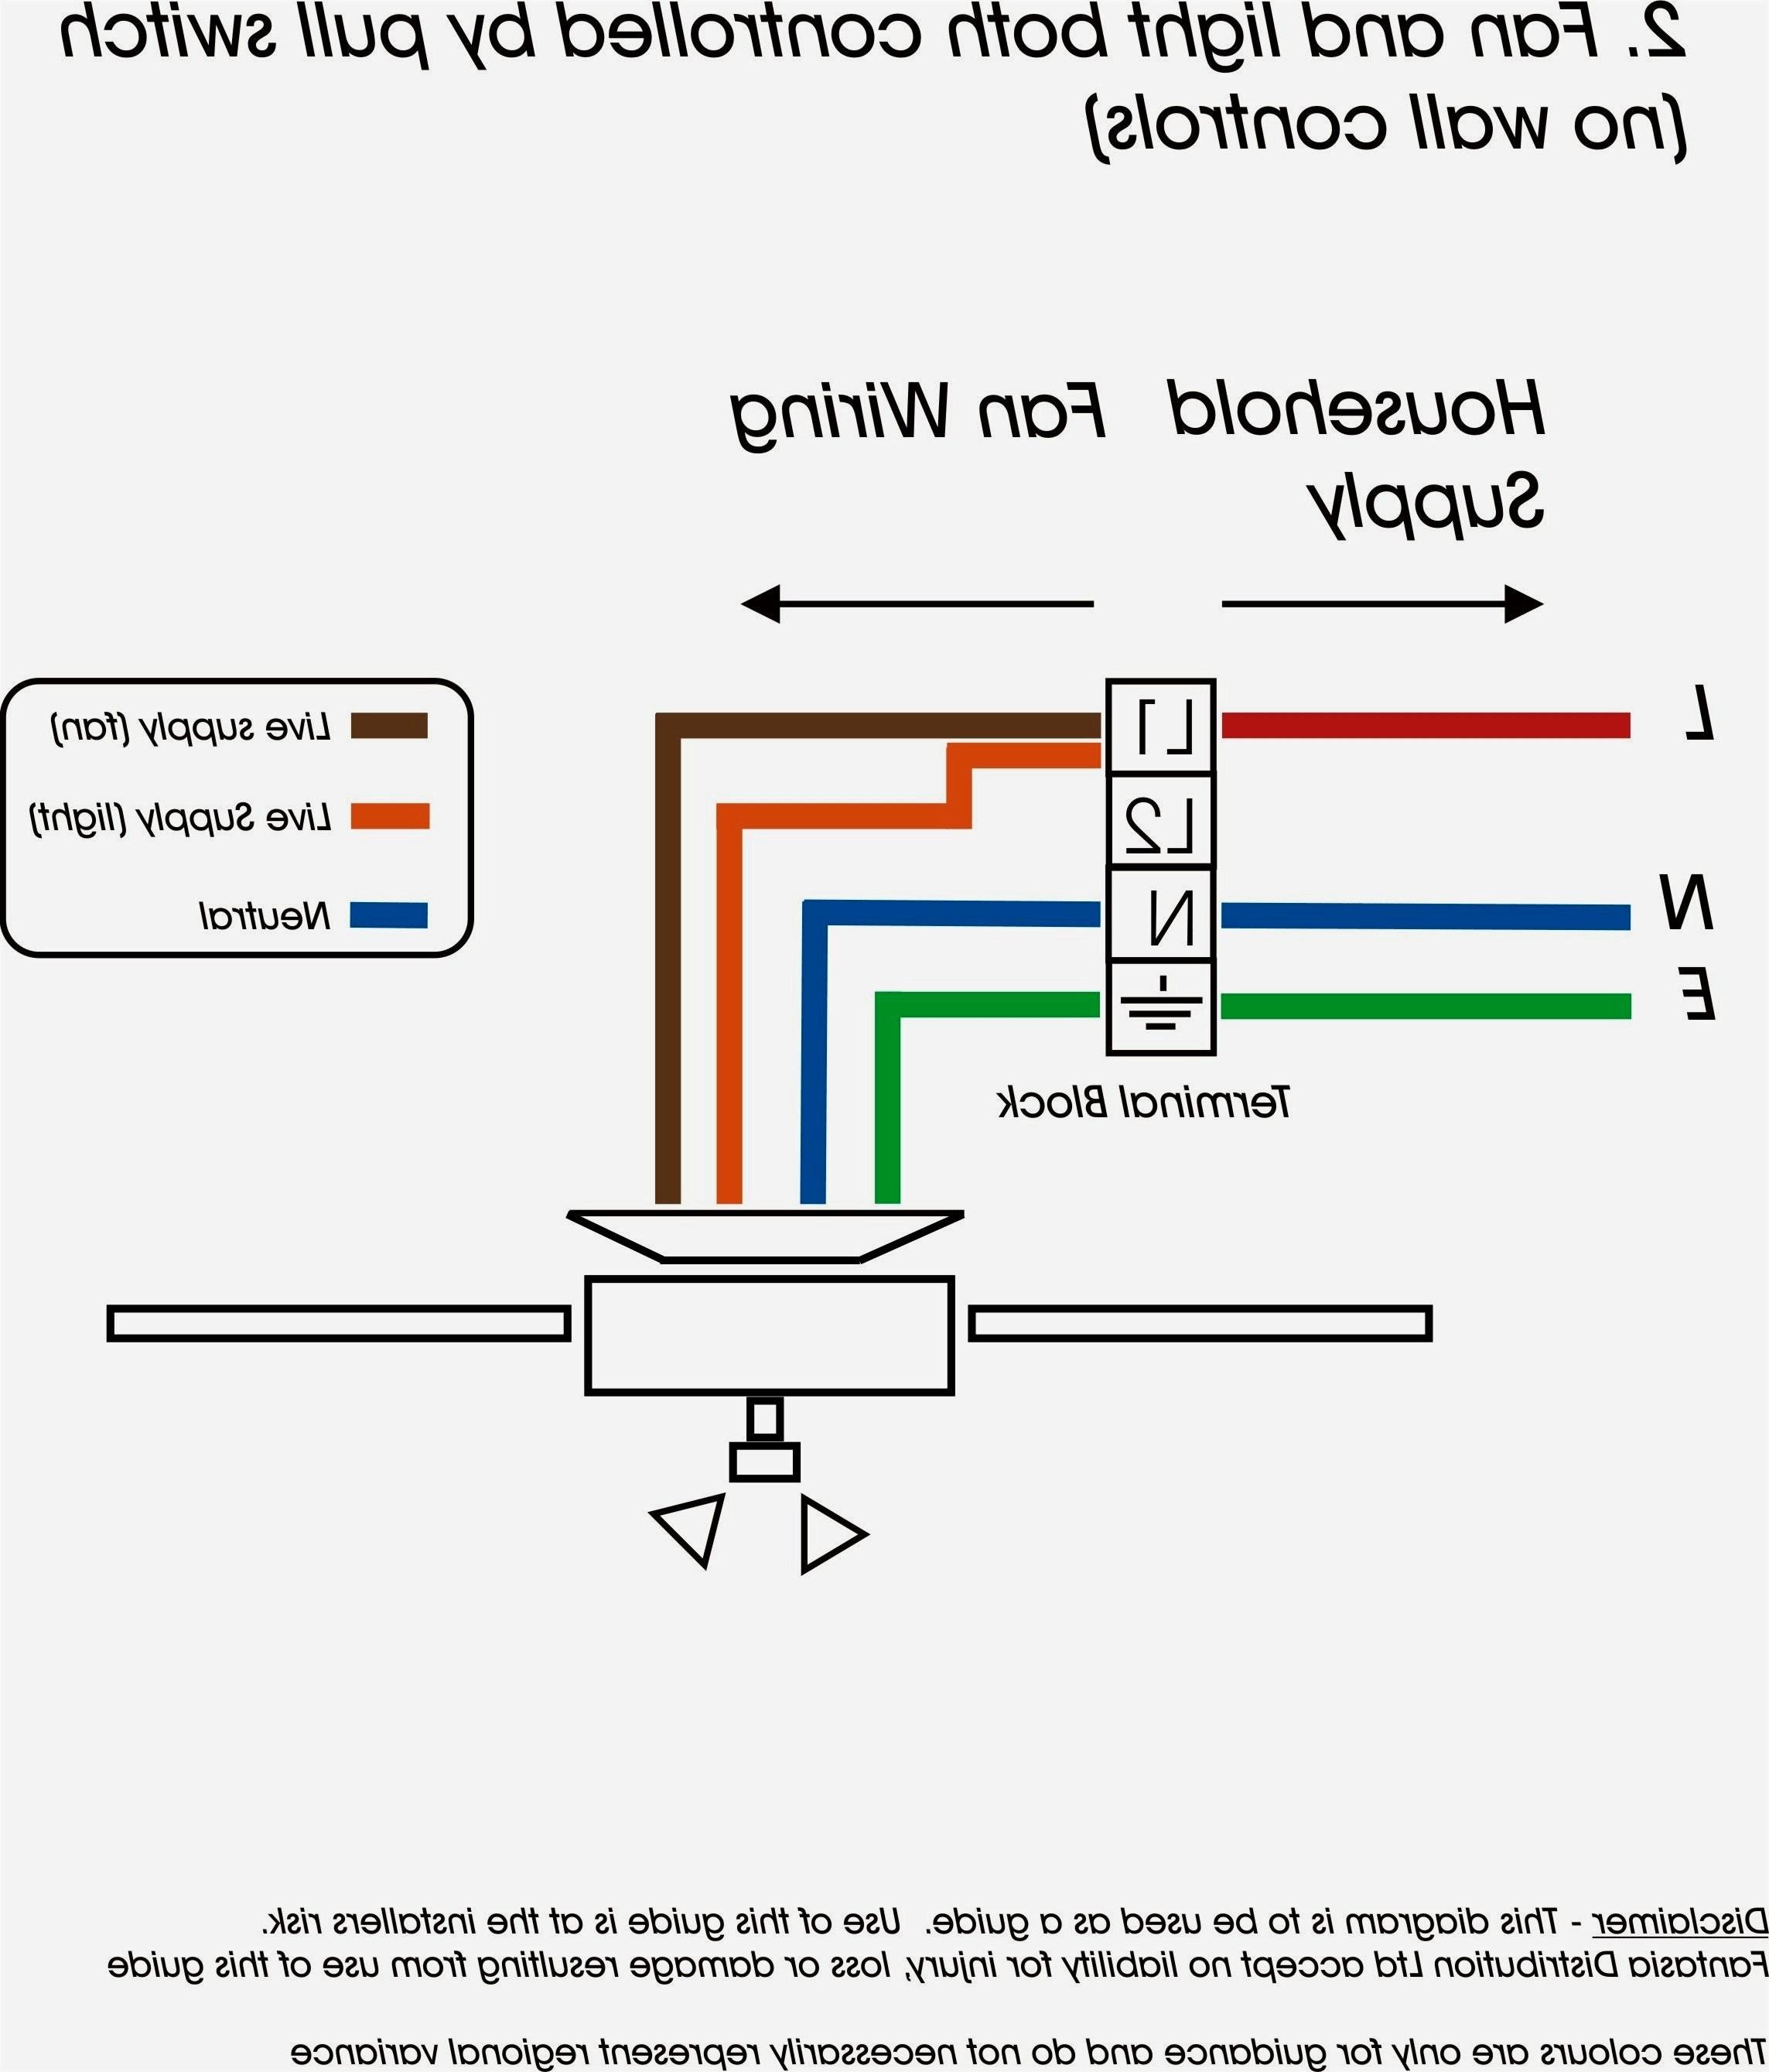 cub lo boy 154 wiring diagram Download-Hallway Light Switch Wiring Diagram New Ceiling Fan Single With 2 18-t